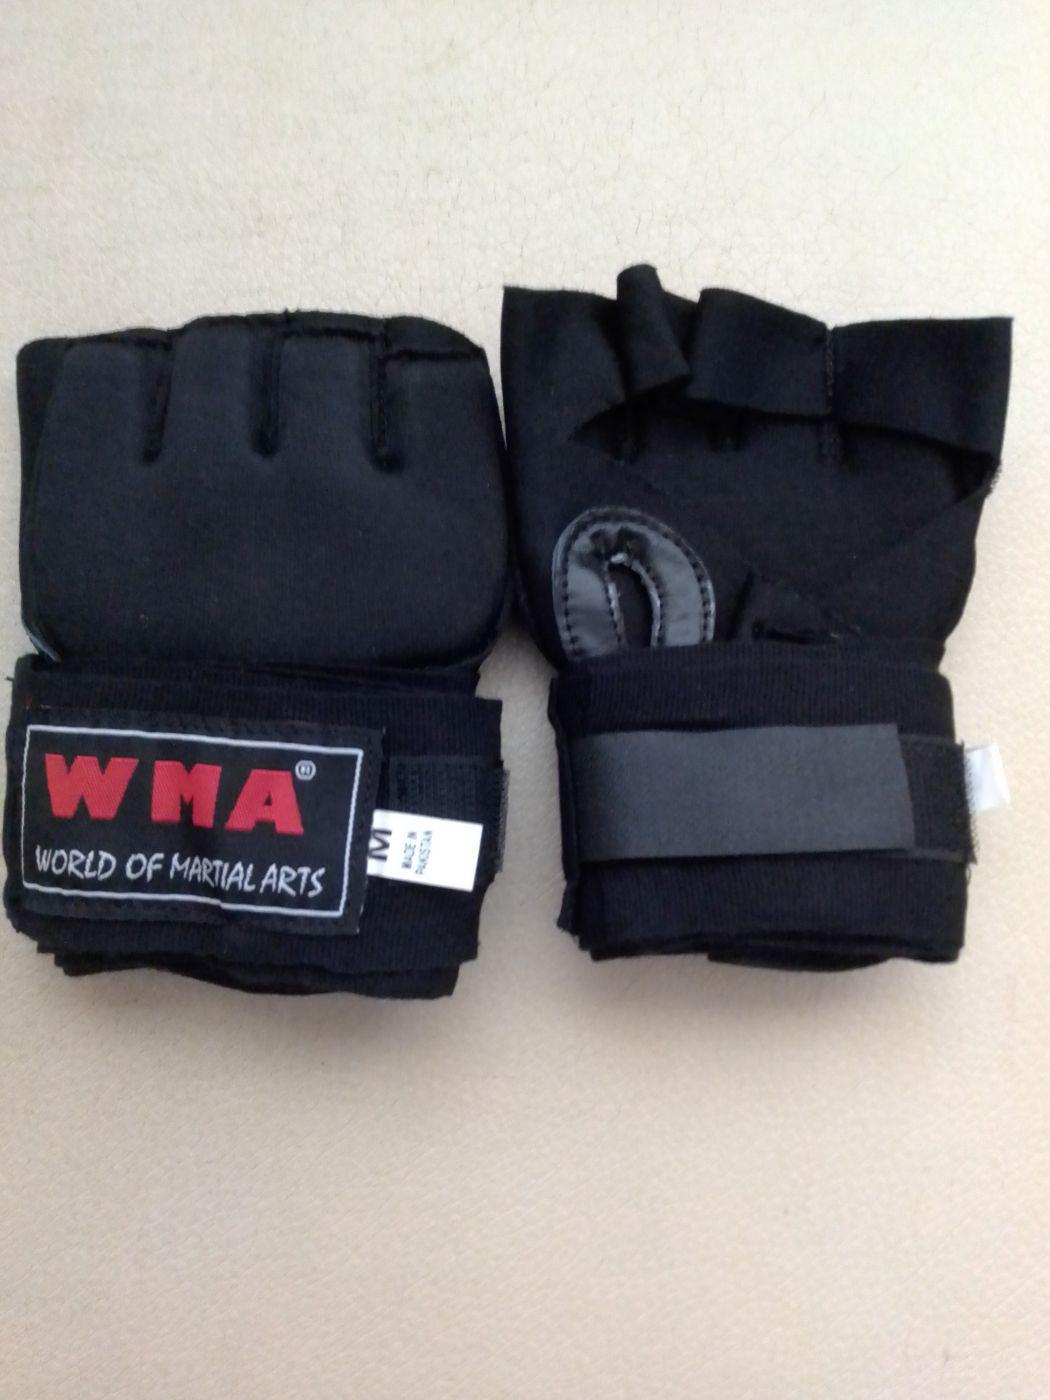 Перчатки, защита кисти с бинтом для единоборств HWG-RB, размер М